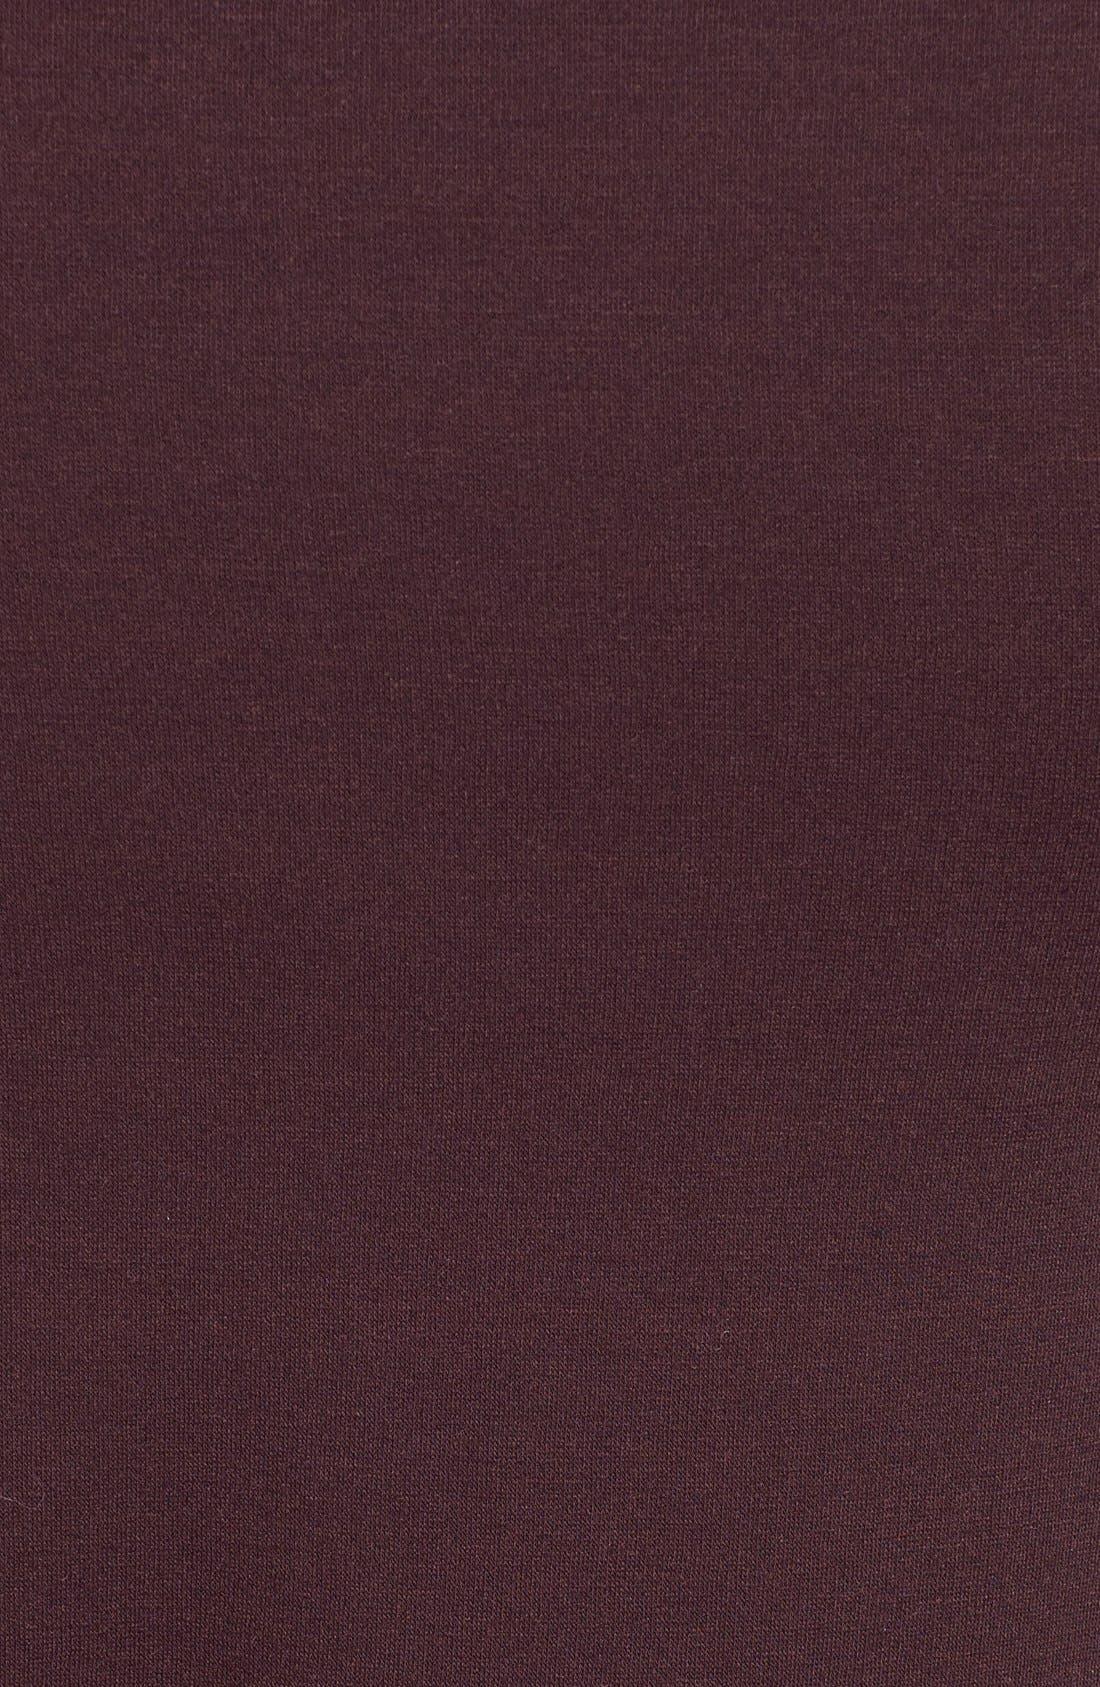 ,                             One-Button Fleece Wrap Cardigan,                             Alternate thumbnail 235, color,                             933